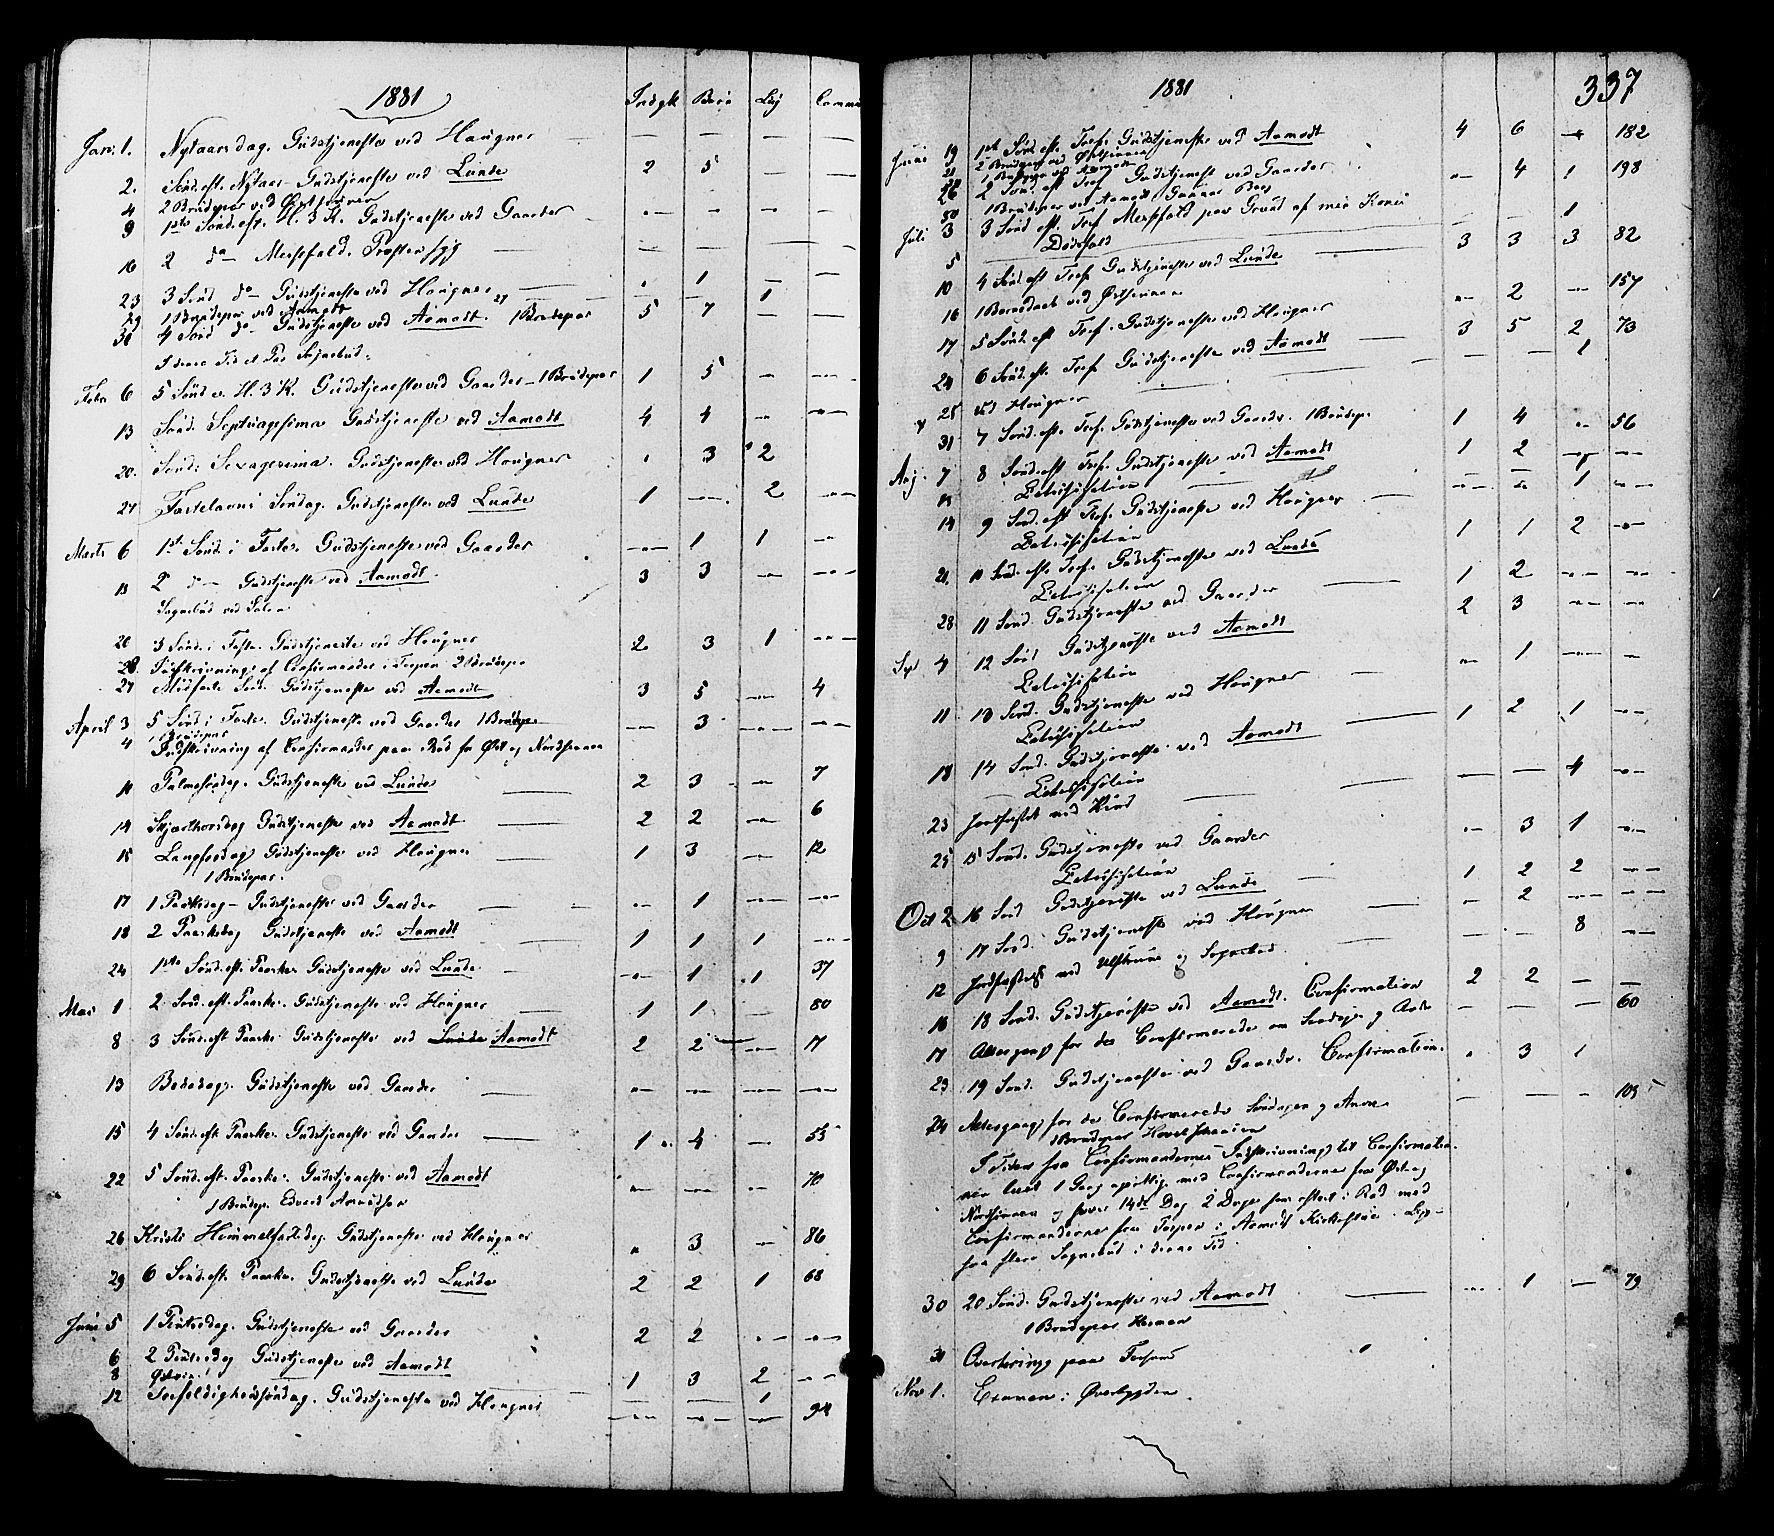 SAH, Nordre Land prestekontor, Ministerialbok nr. 2, 1872-1881, s. 337